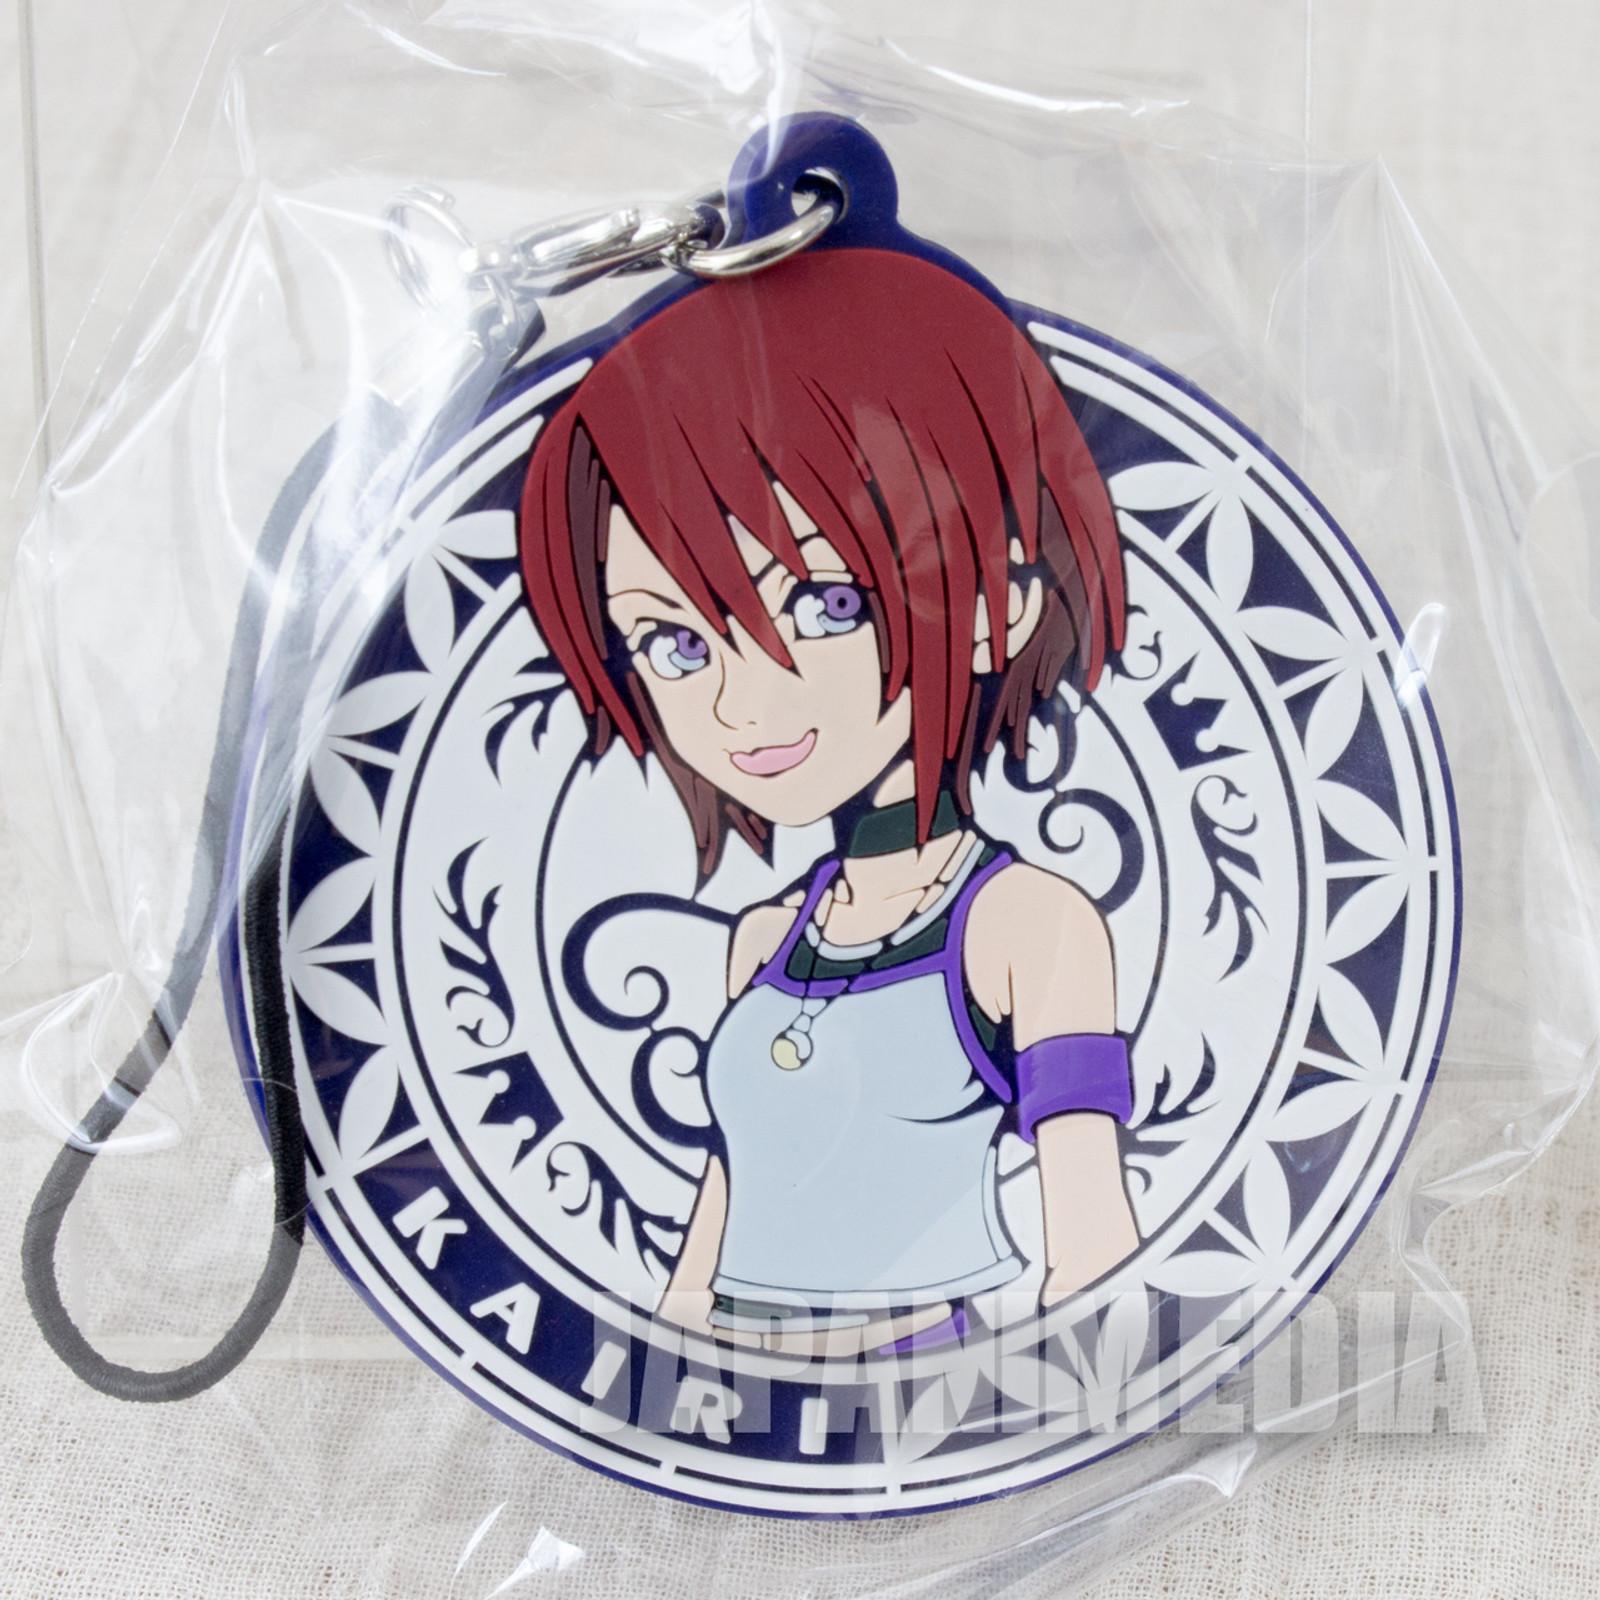 Kingdom Hearts KAIRI Mascot Rubber Strap Square Enix JAPAN